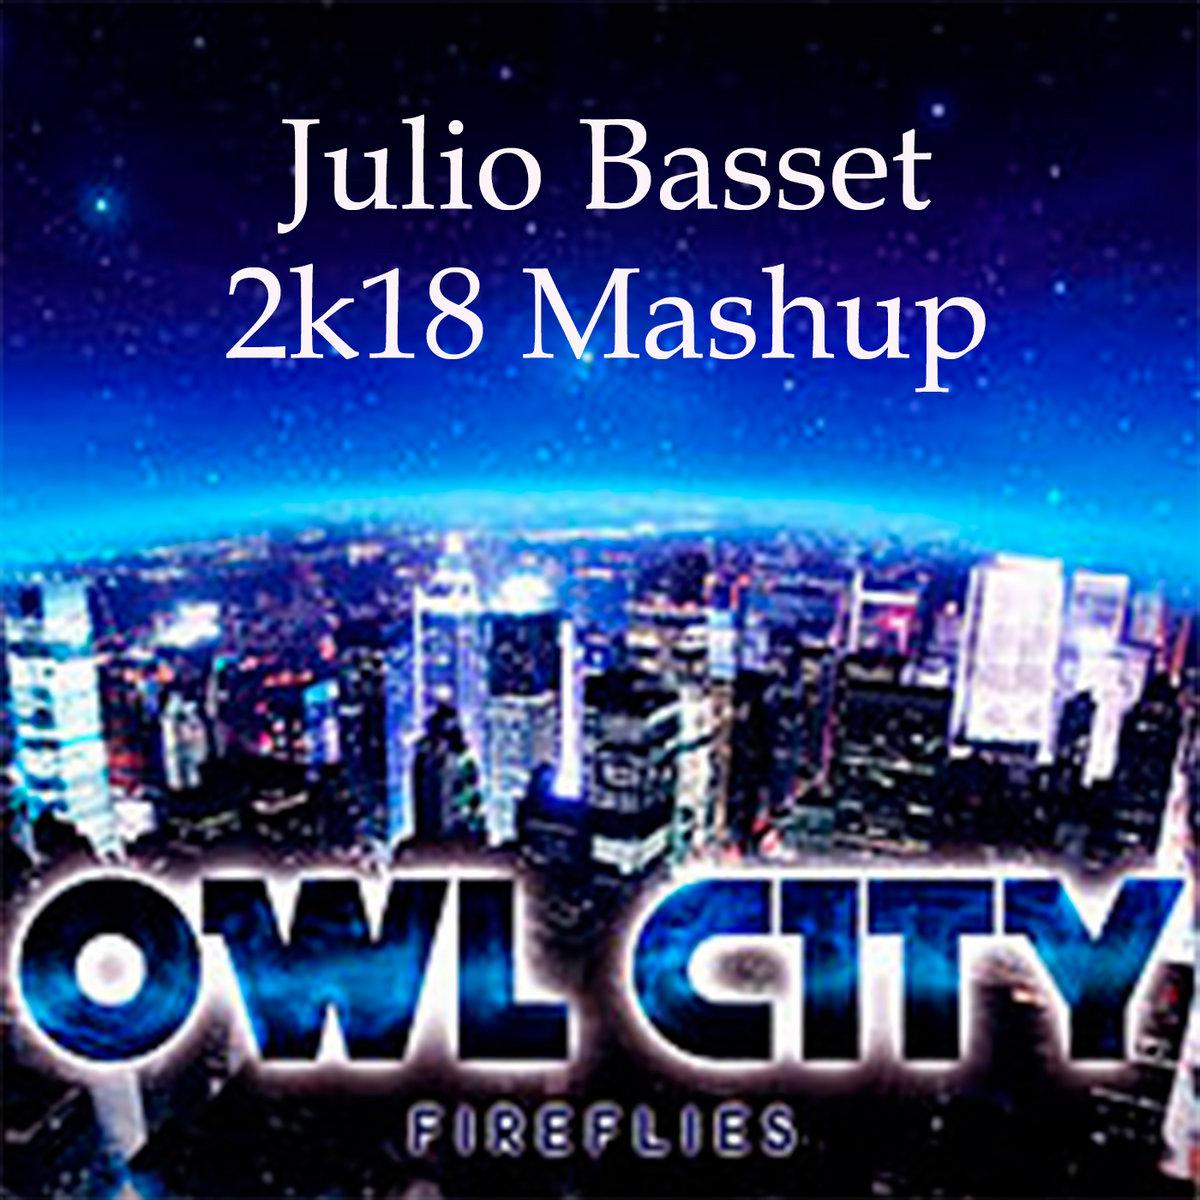 Own City, M  Avrahami, A  Natal, Leanh - Fireflies (Julio Basset